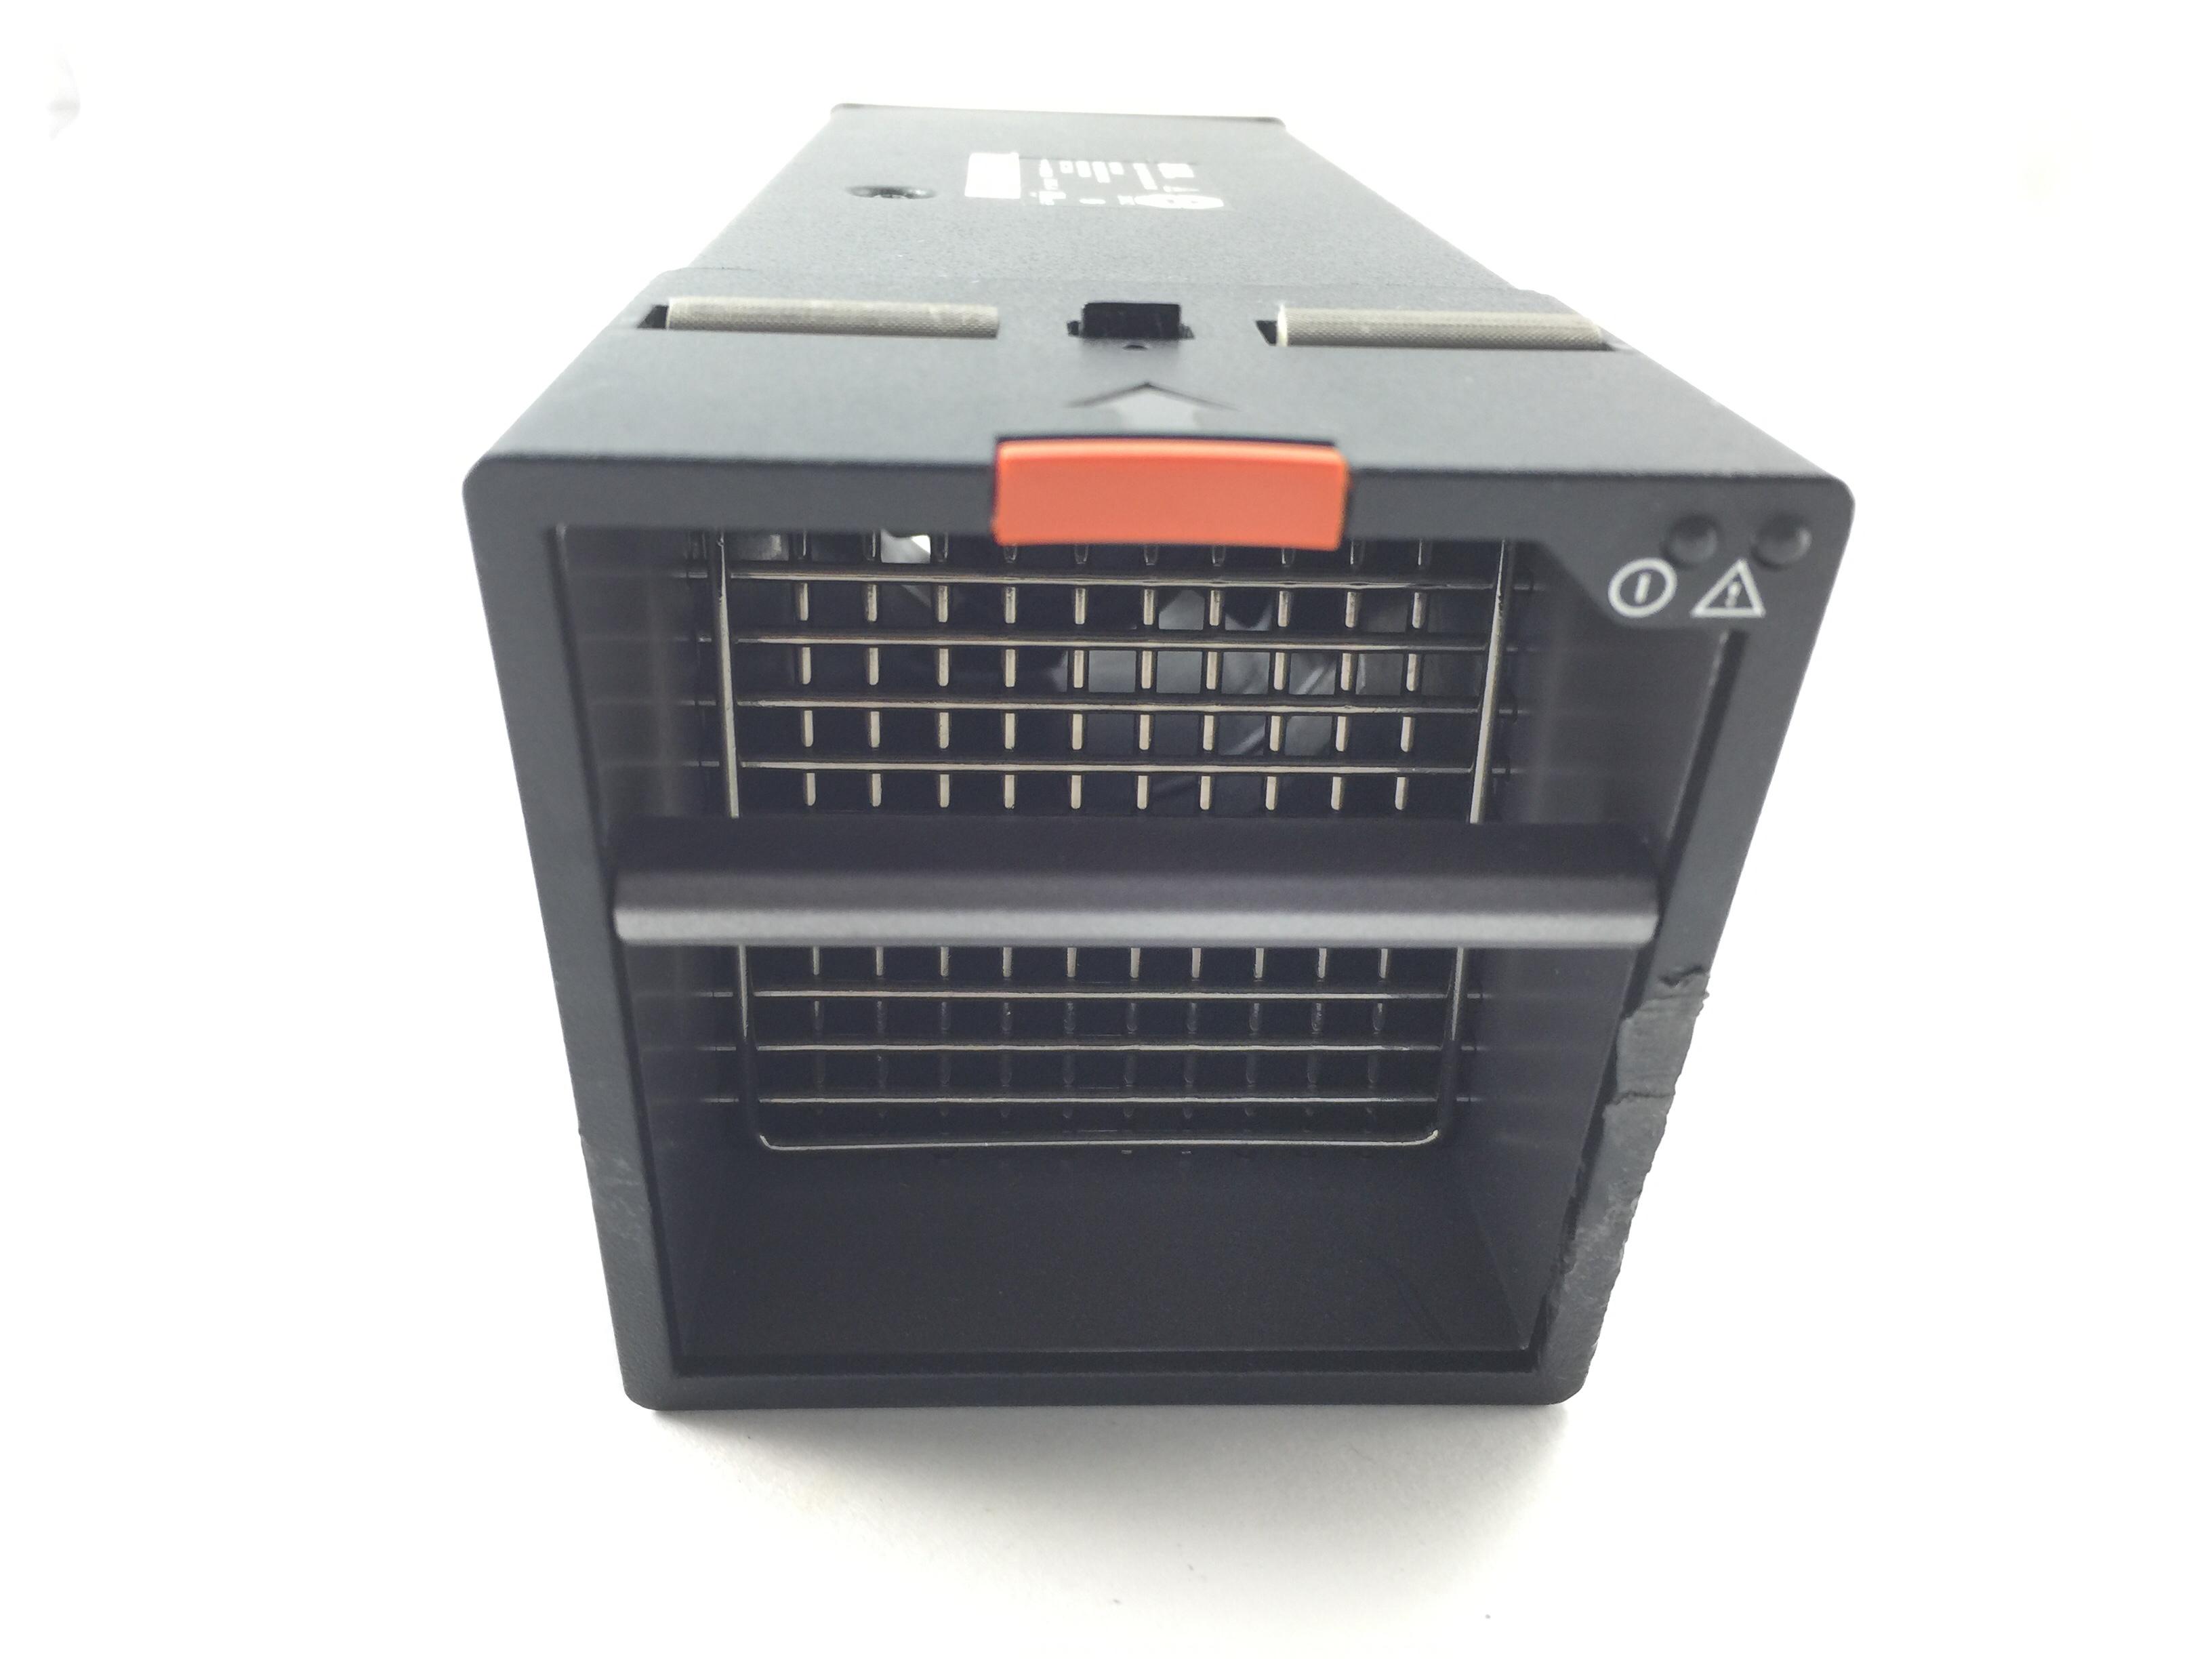 Dell PowerEdge M1000E System Fan R80J12BS1PB-07A02 (HWFJ0)